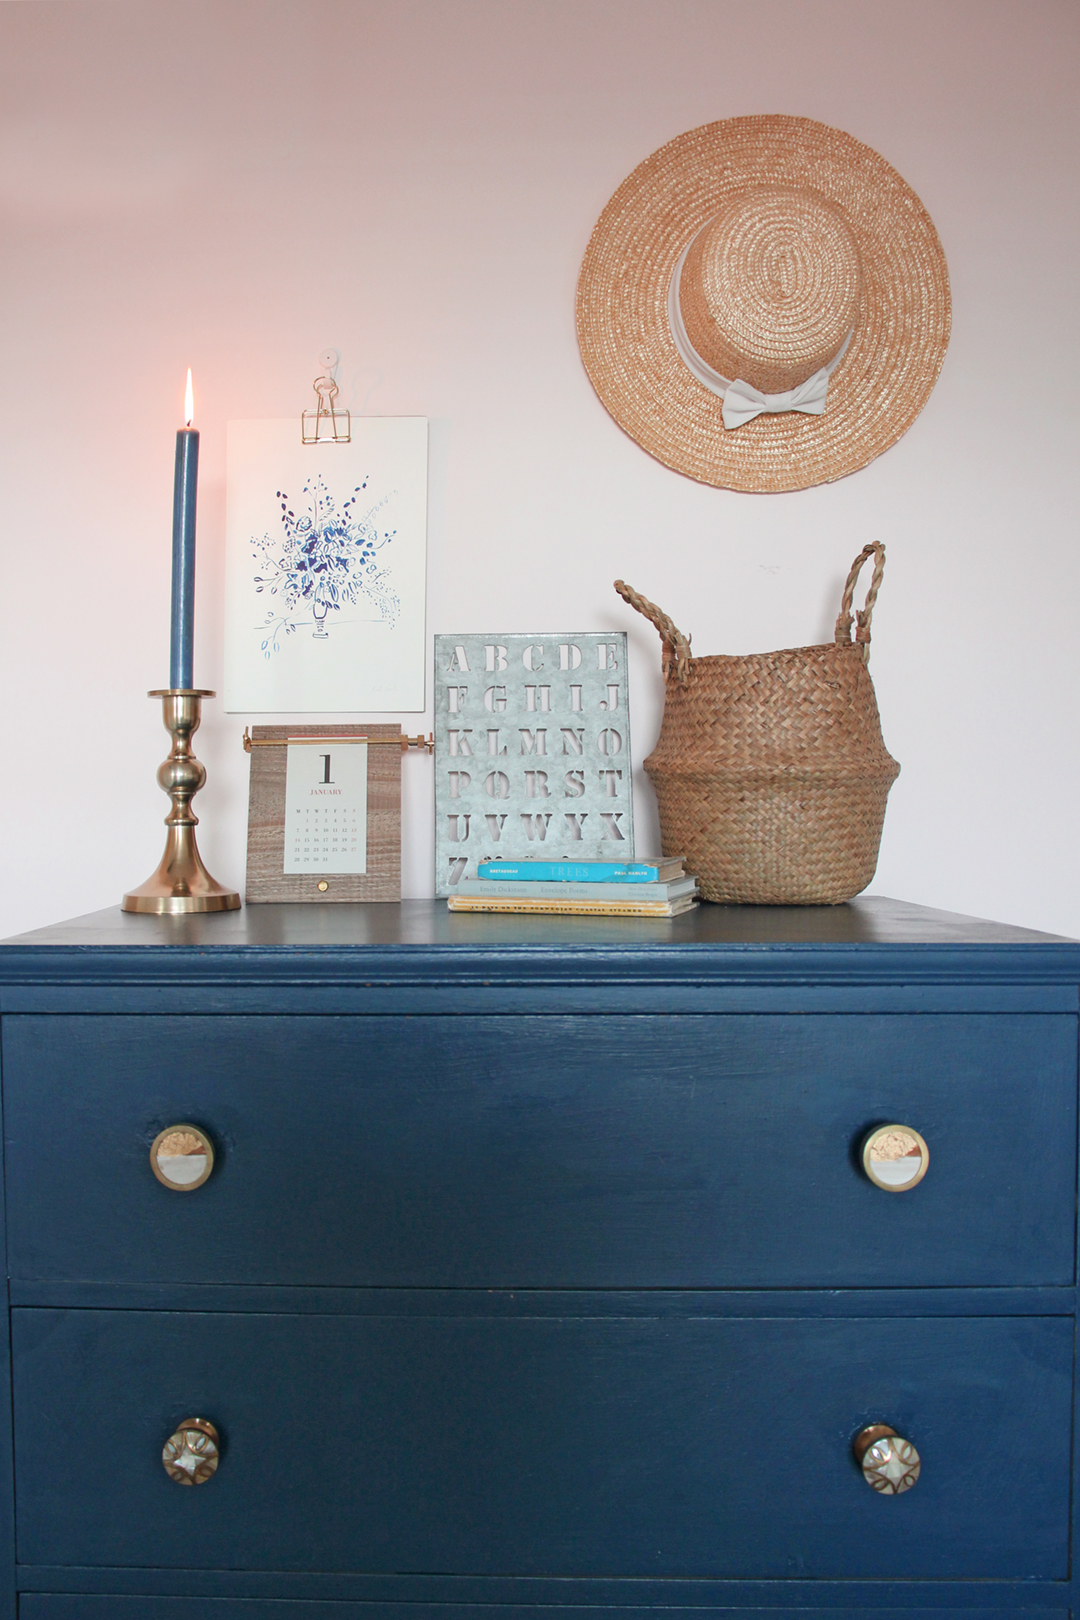 Nancy-Straughan-Interior-Stylist-Blog-Bedroom-re-Style-Spring.jpg